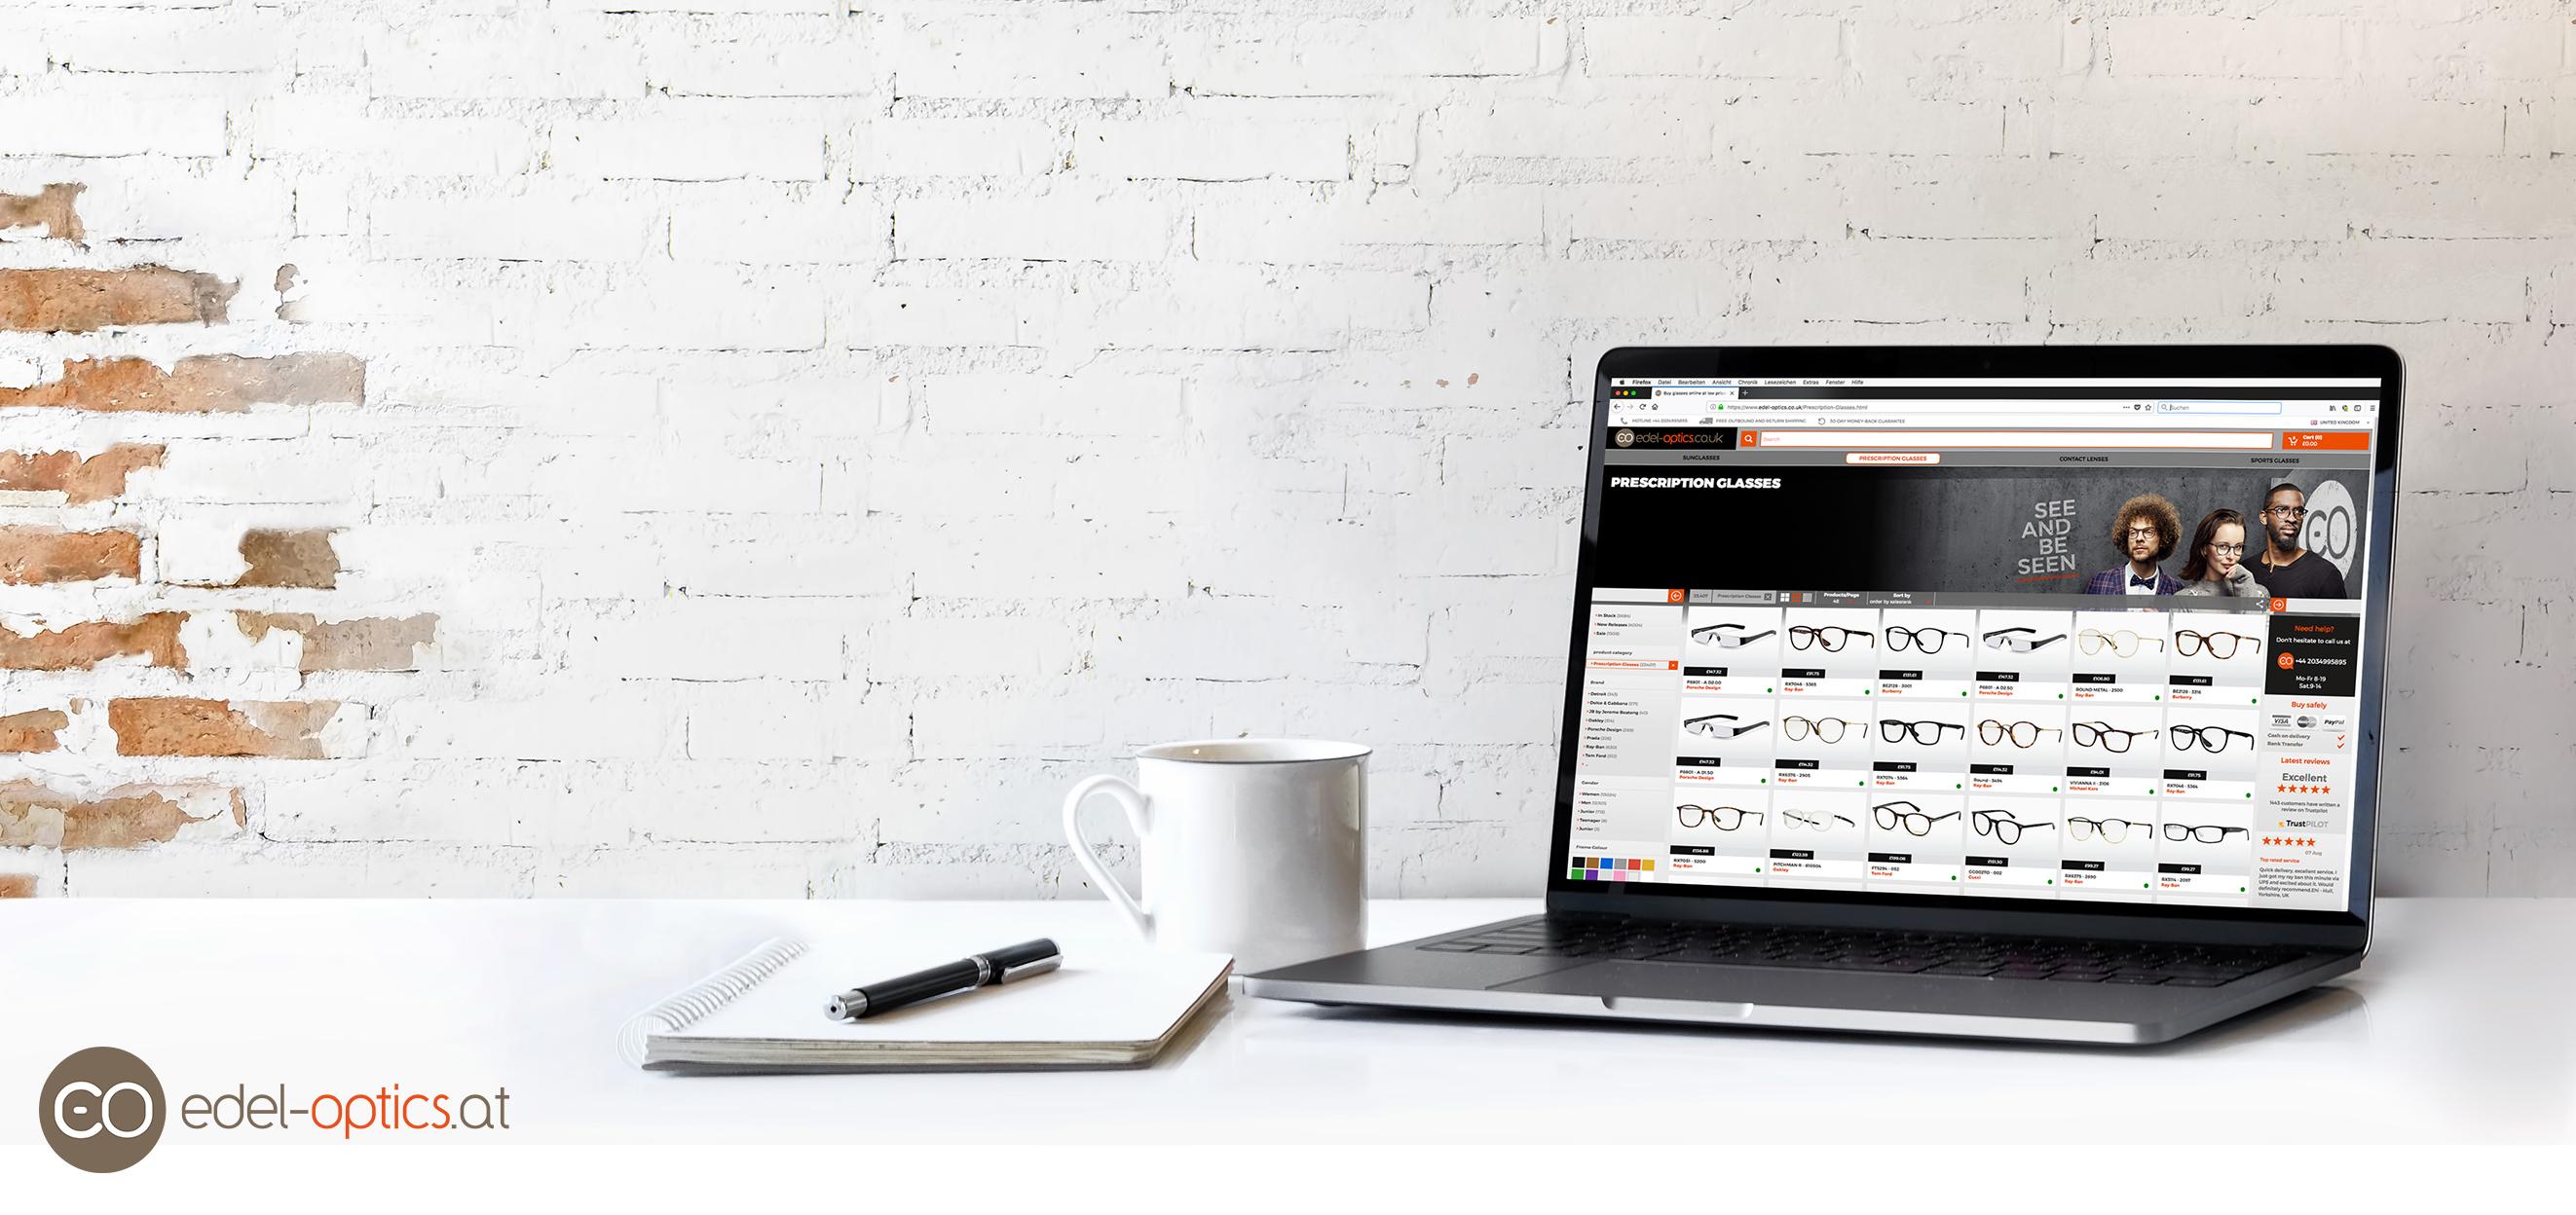 brille online kaufen geht das berhaupt edel optics blog. Black Bedroom Furniture Sets. Home Design Ideas